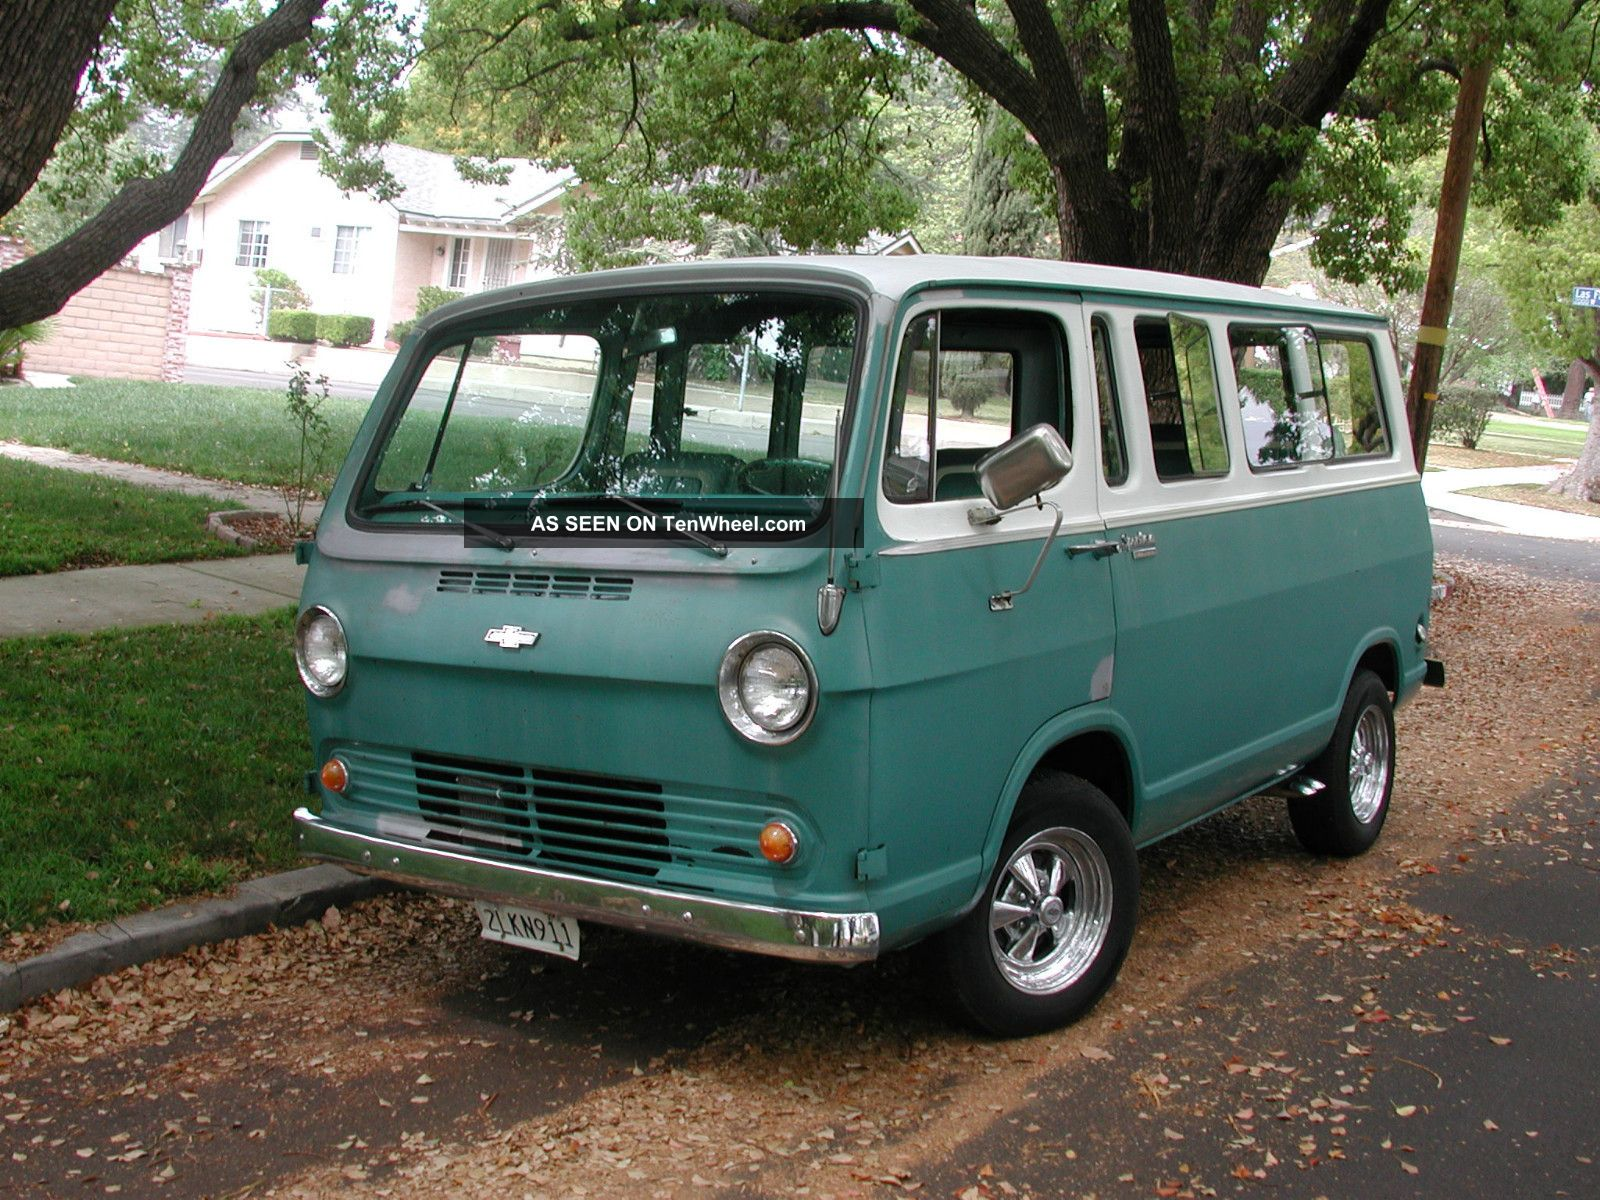 1965 Chevrolet Van Craigslist | Autos Post